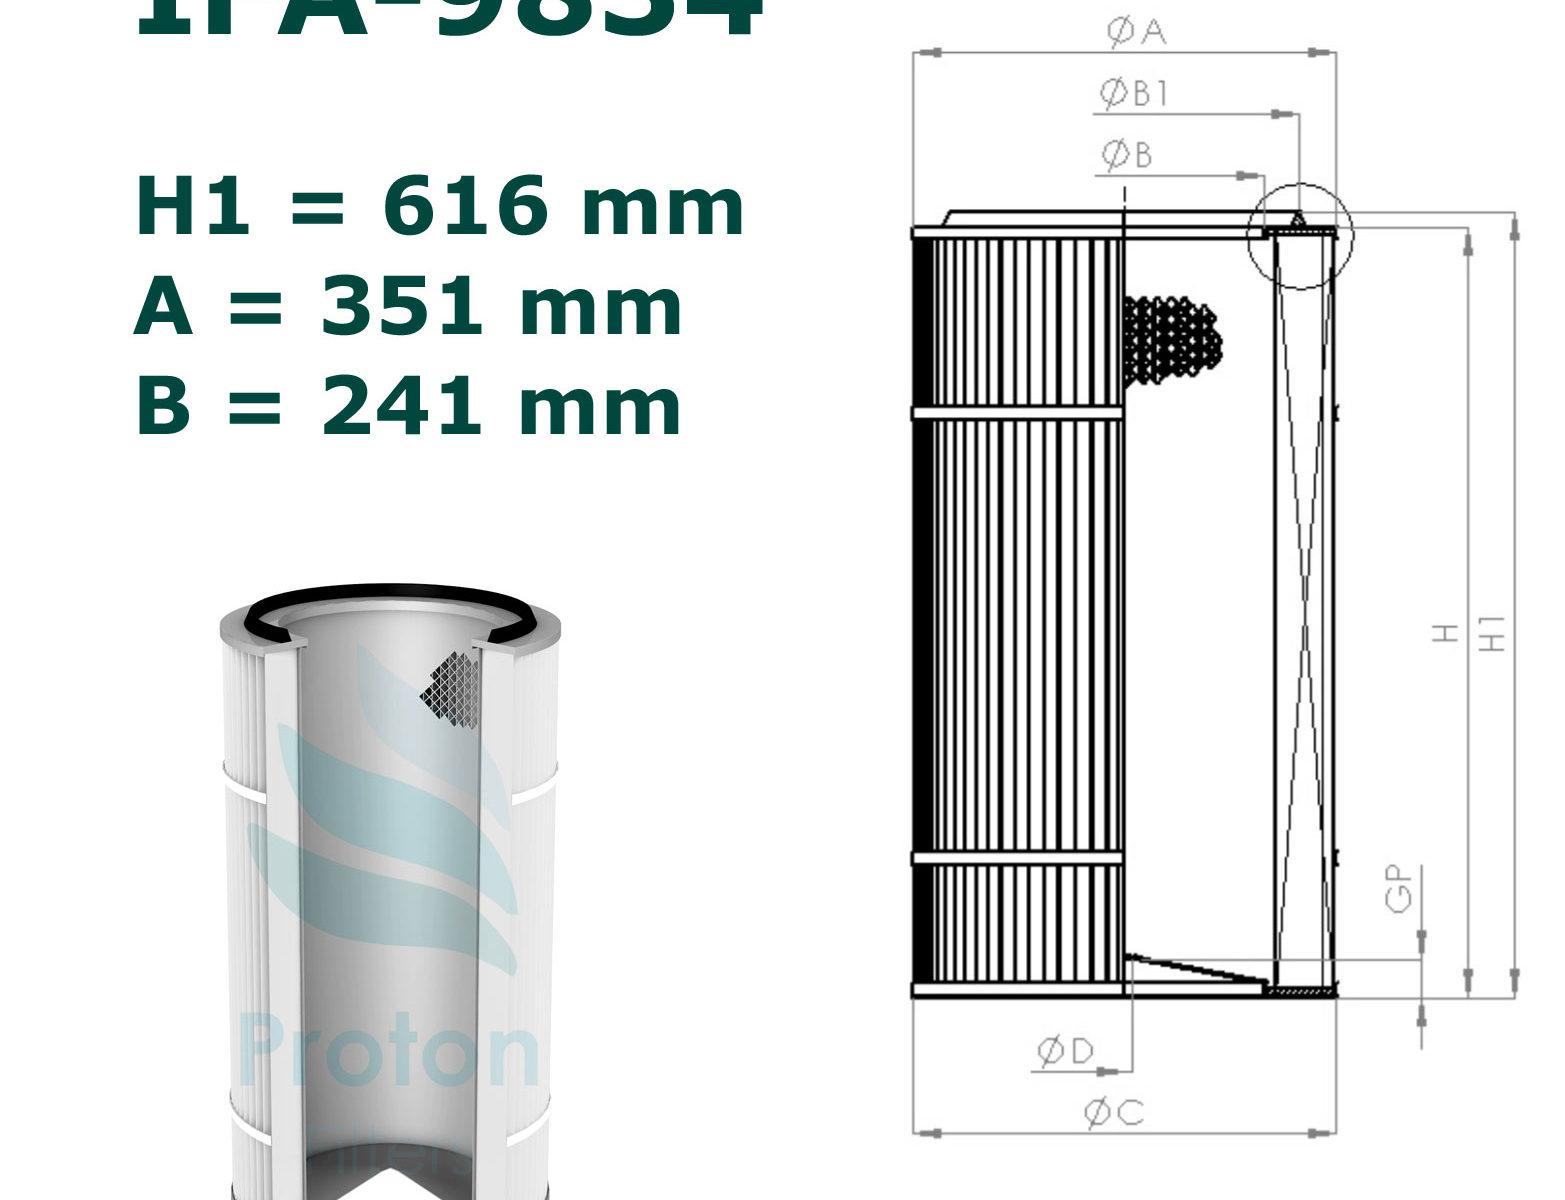 IFA-9834-1565x1200